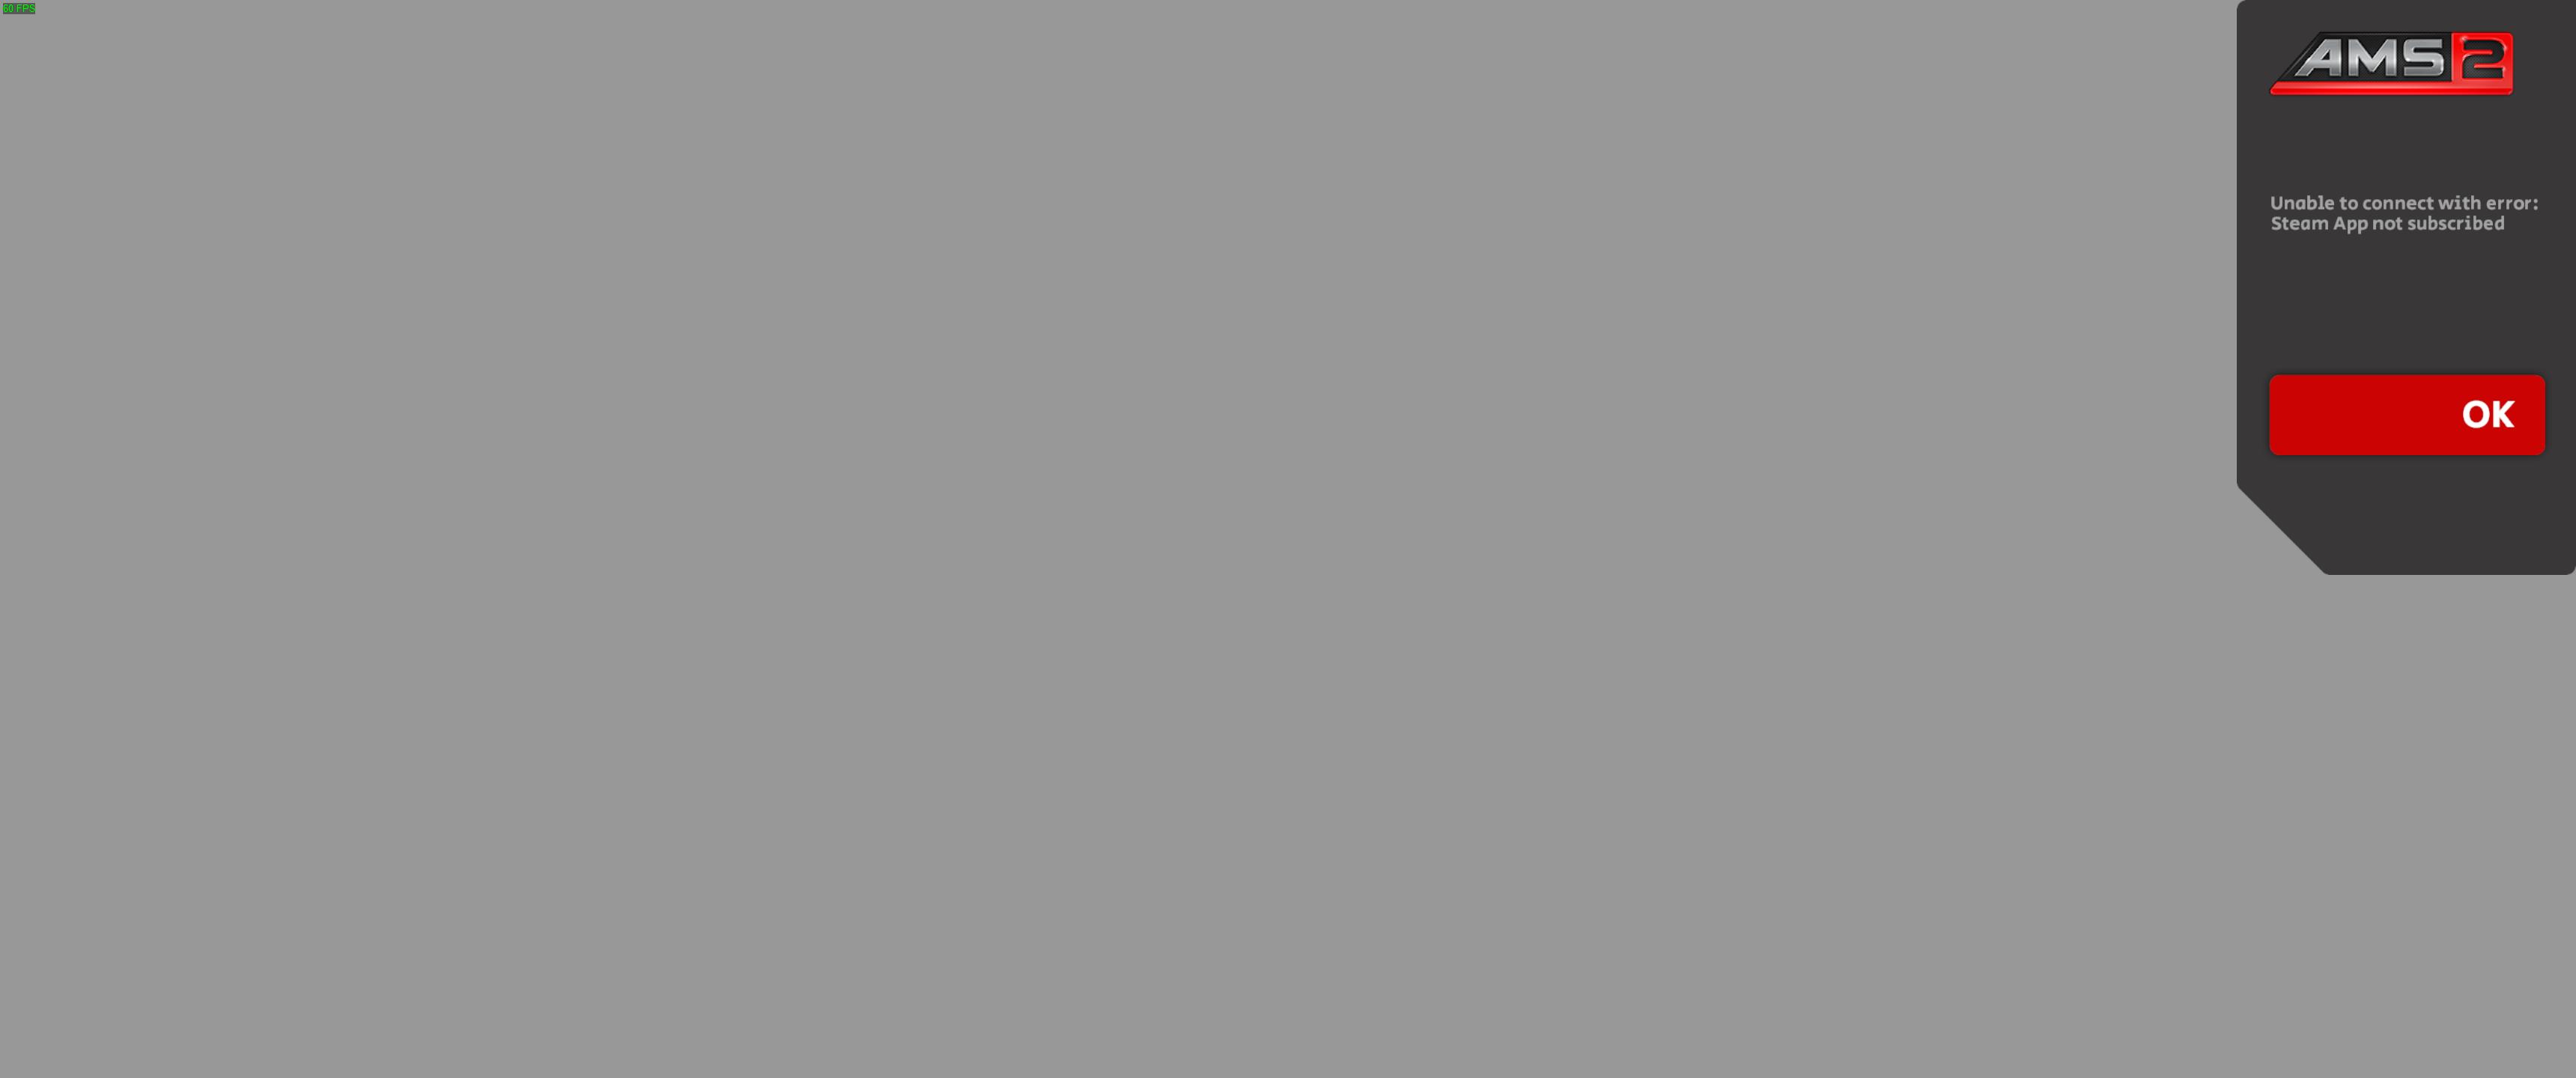 Automobilista 2 Beta 02_03_2021 17_05_44.png